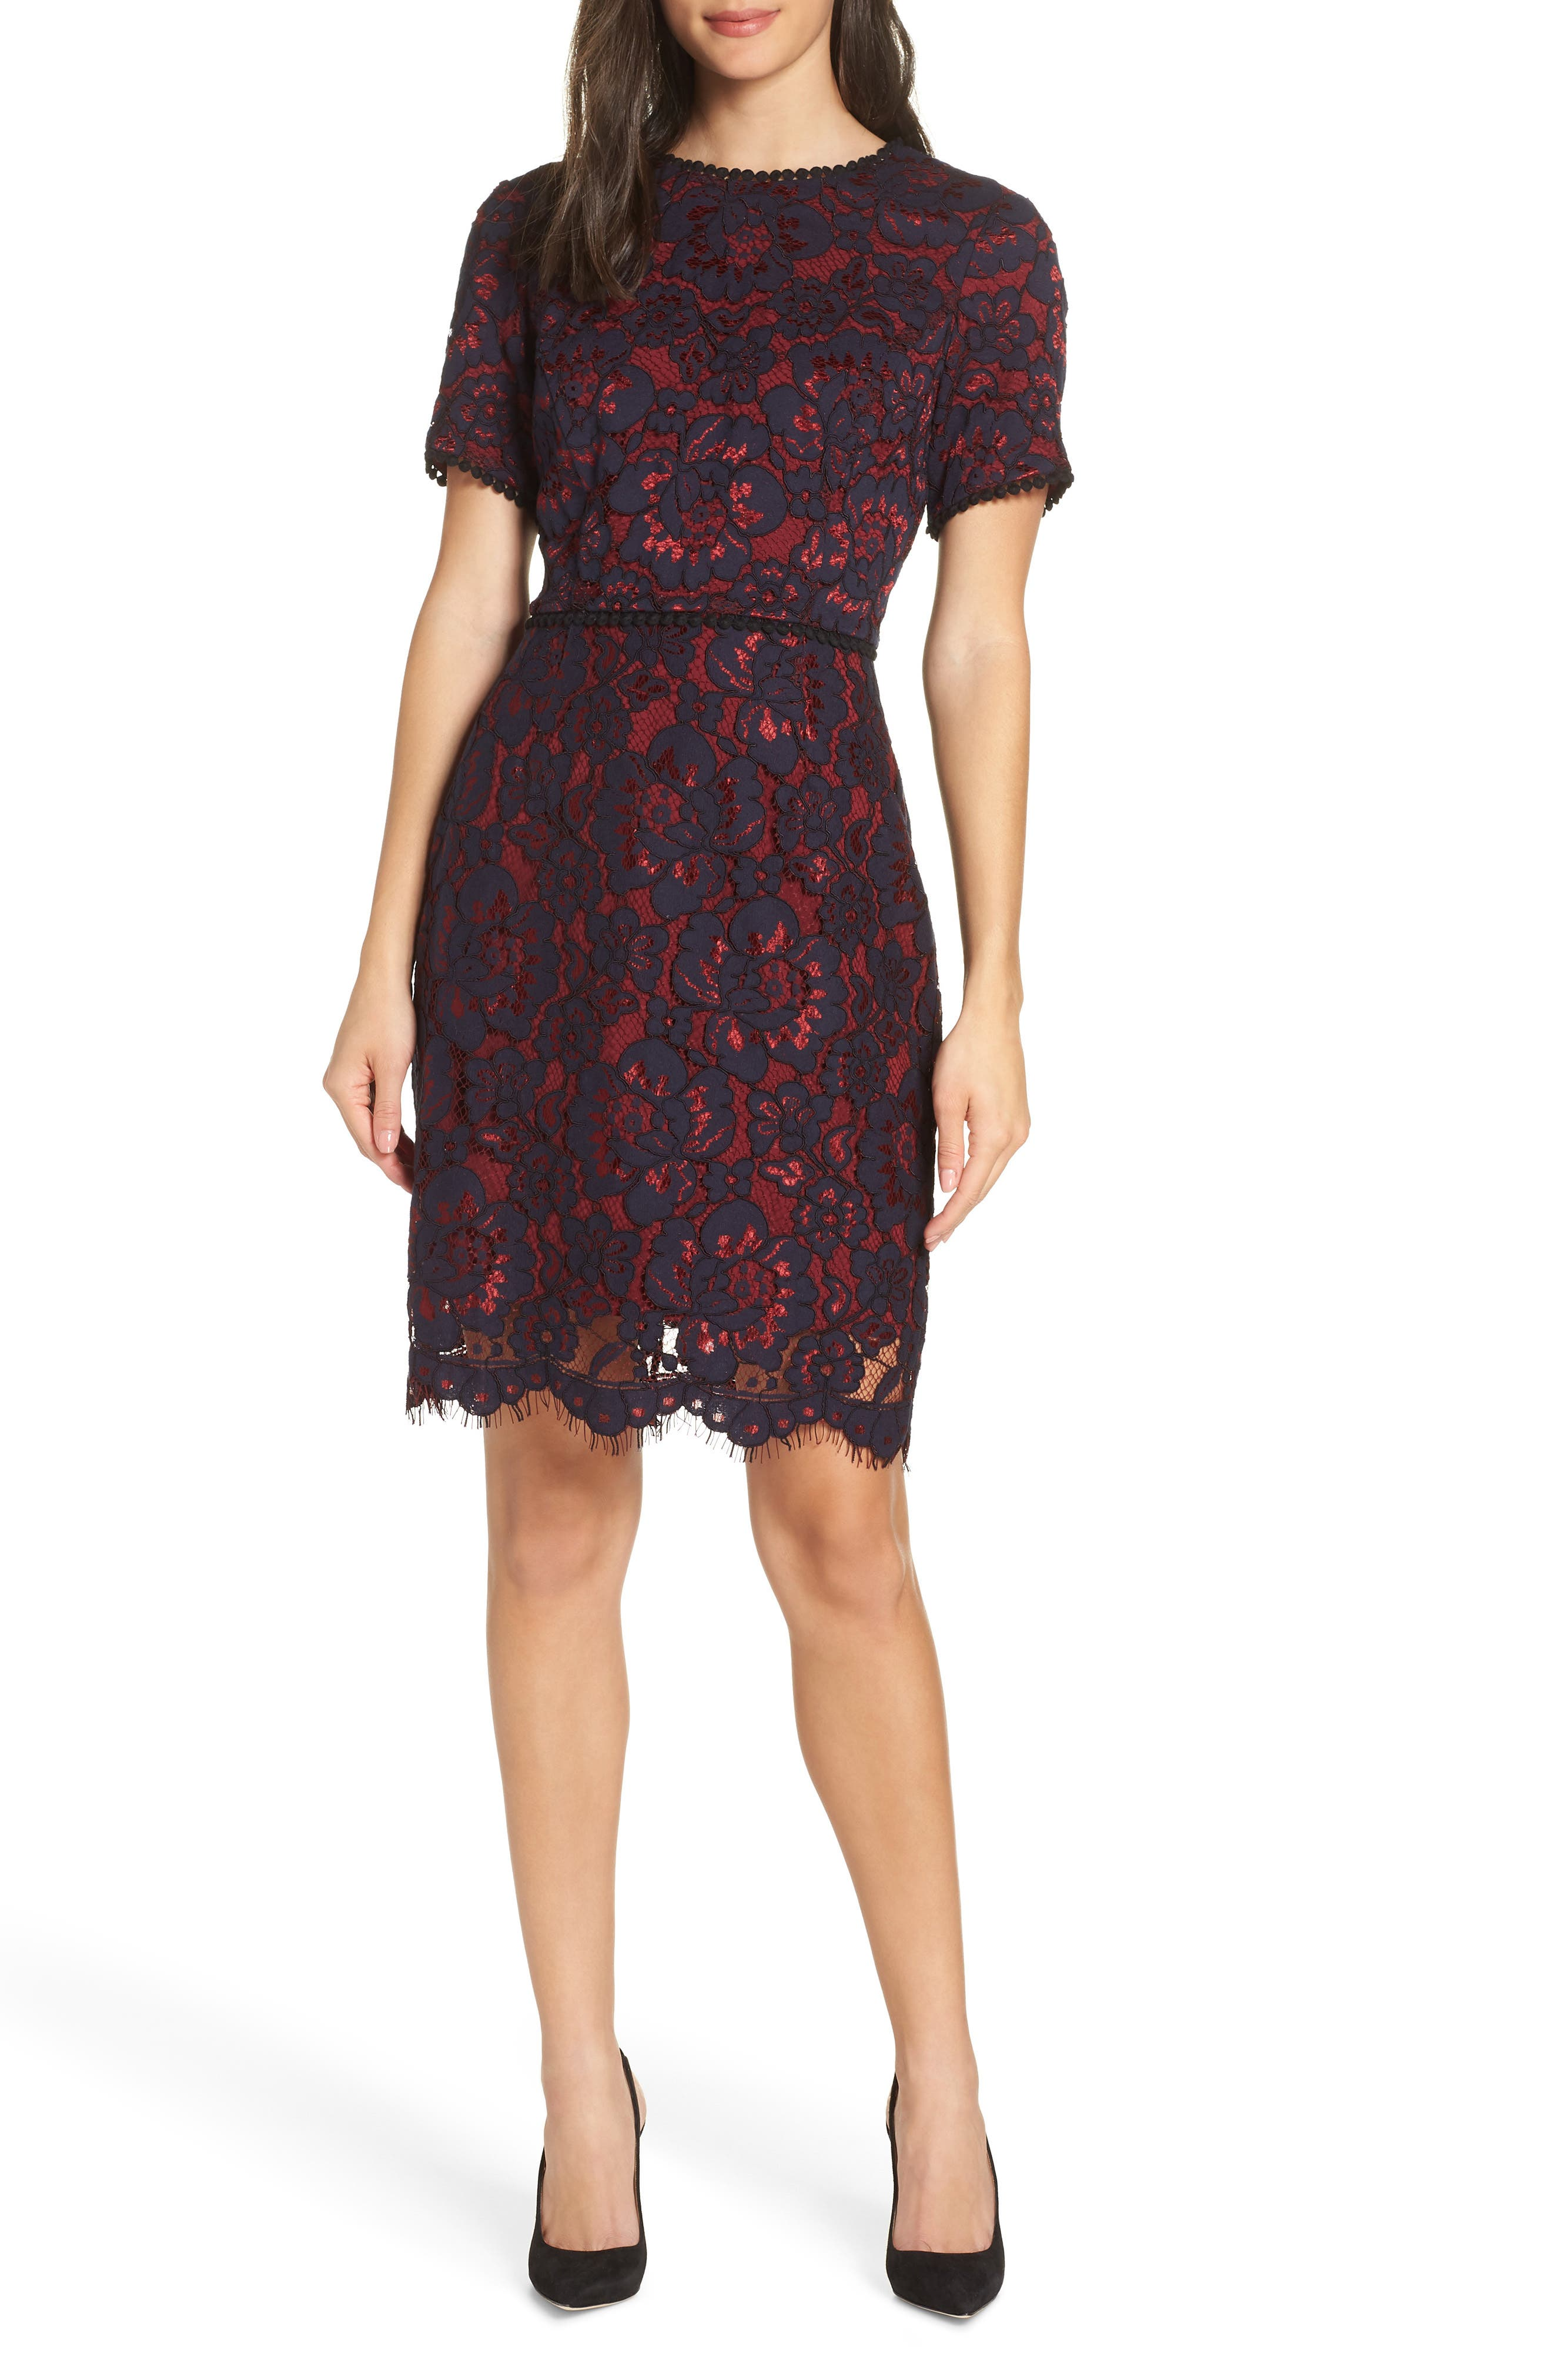 Lace Sheath Dress,                             Main thumbnail 1, color,                             NAVY/ WINE LACE